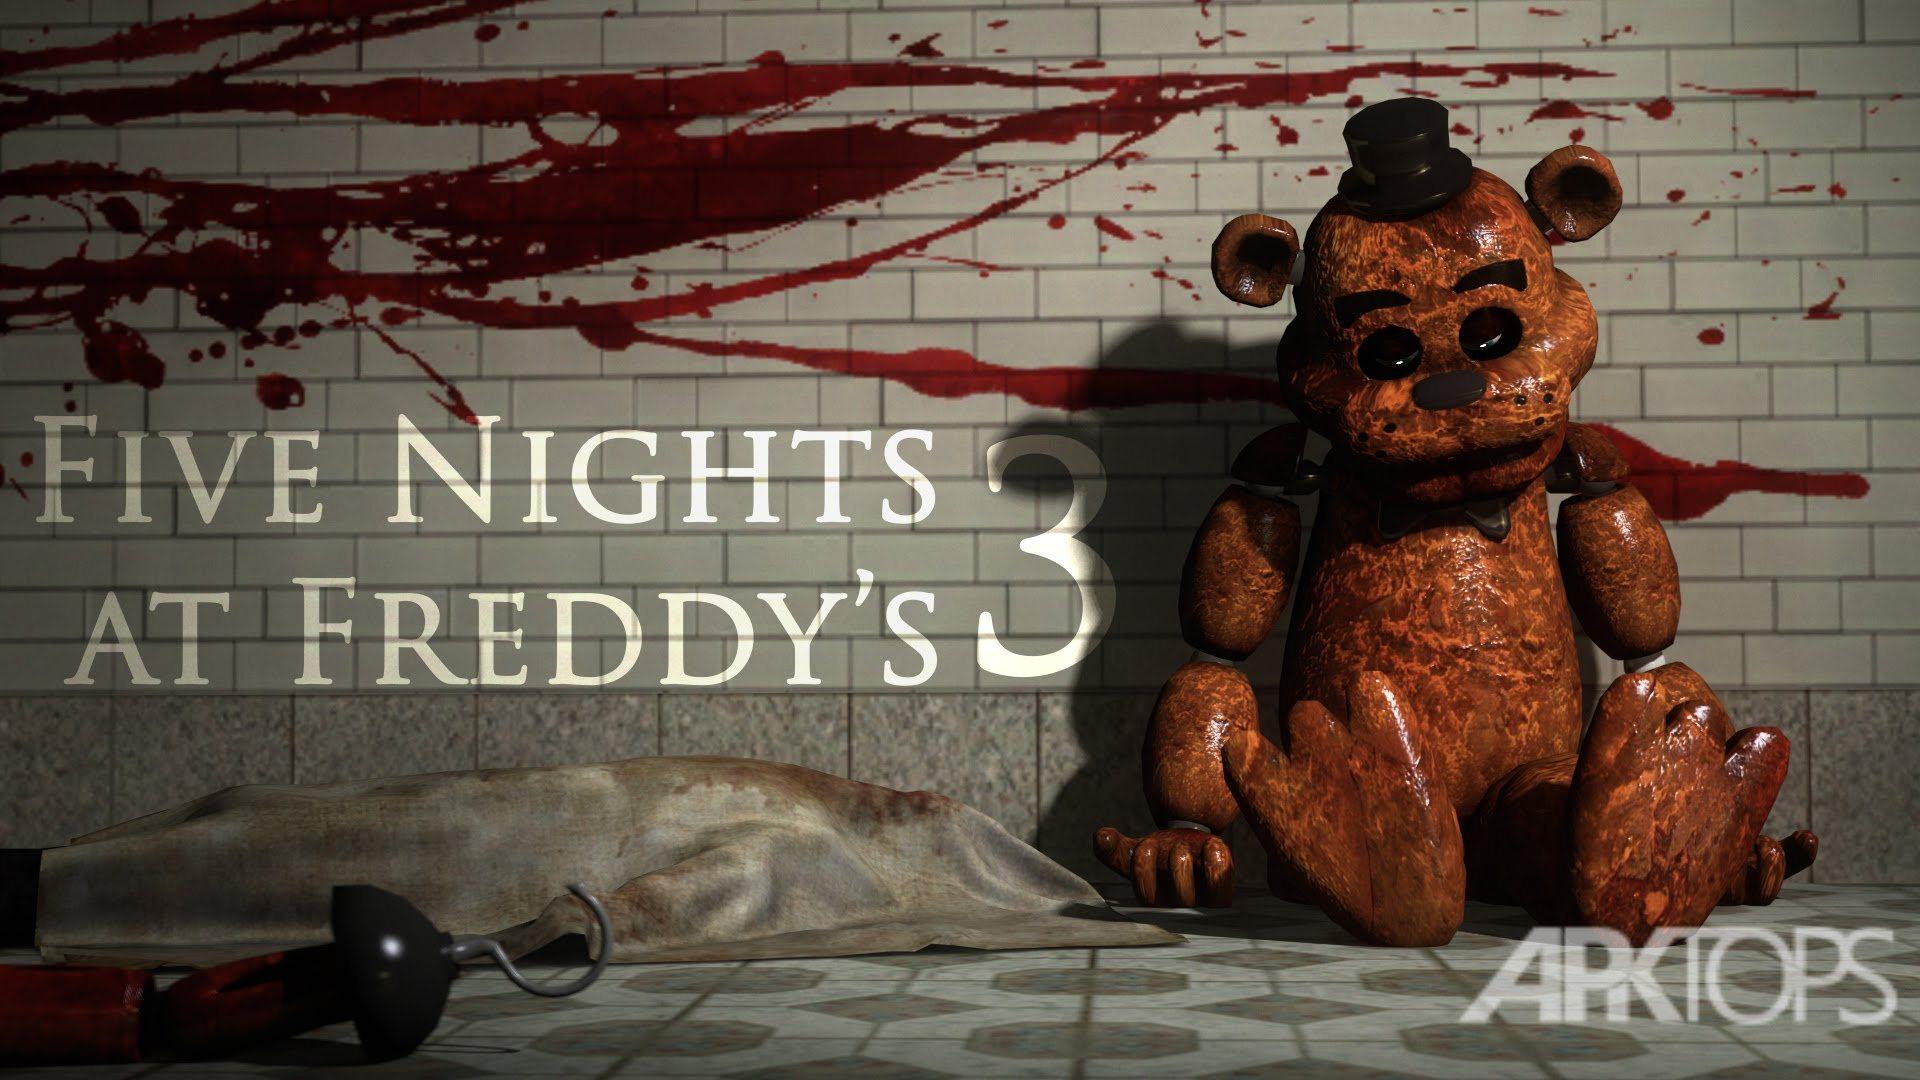 Five Nights at Freddy's 3[APKTOPS.ir]